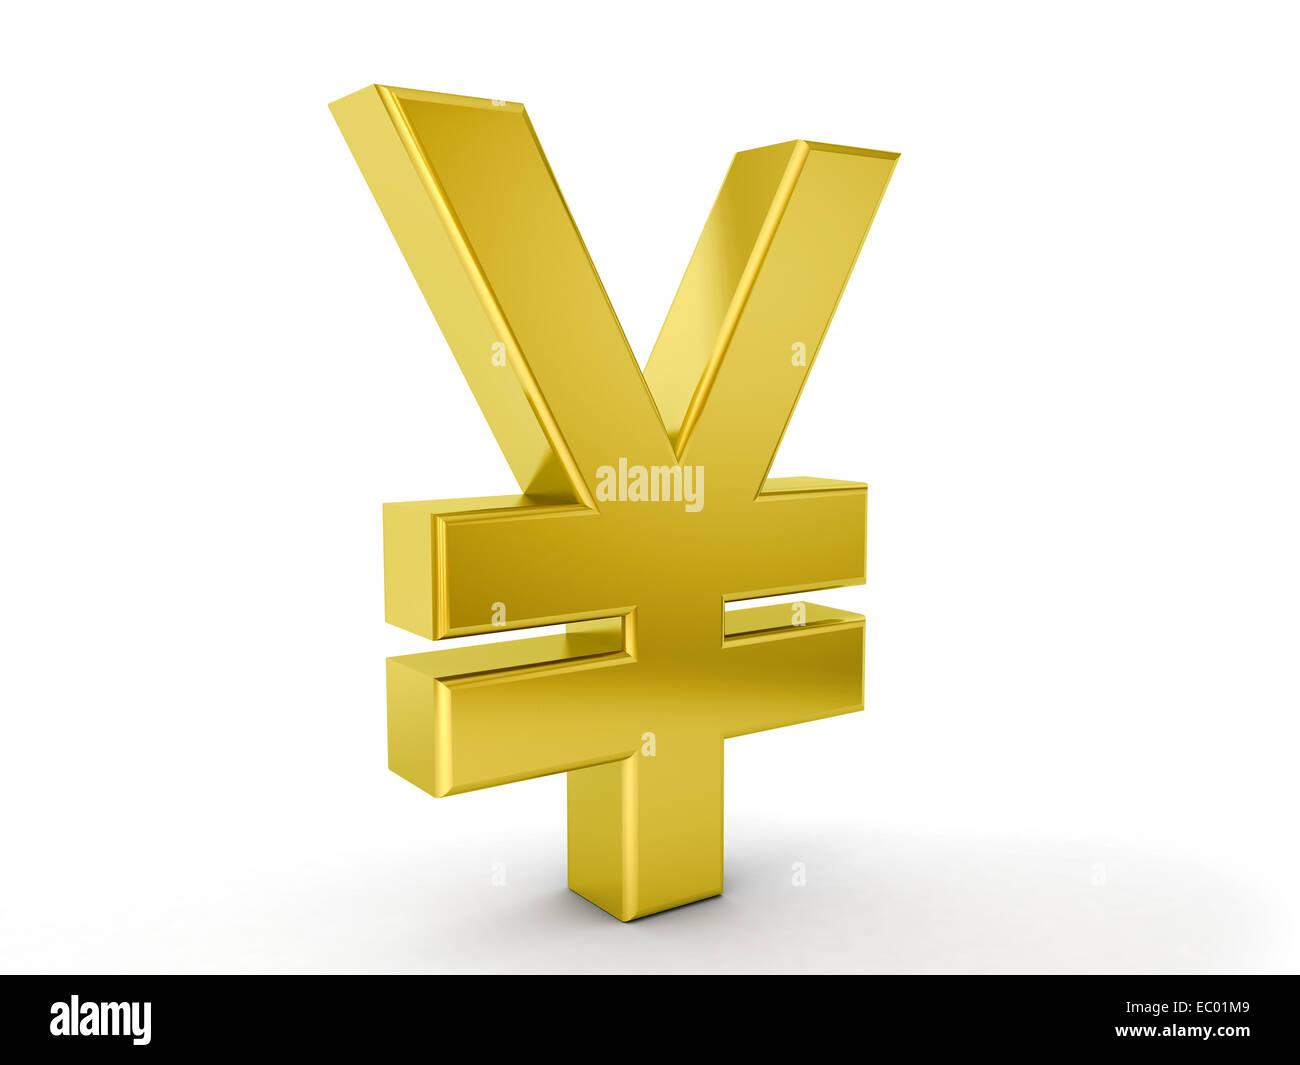 Gold yen symbol on a white background. - Stock Image